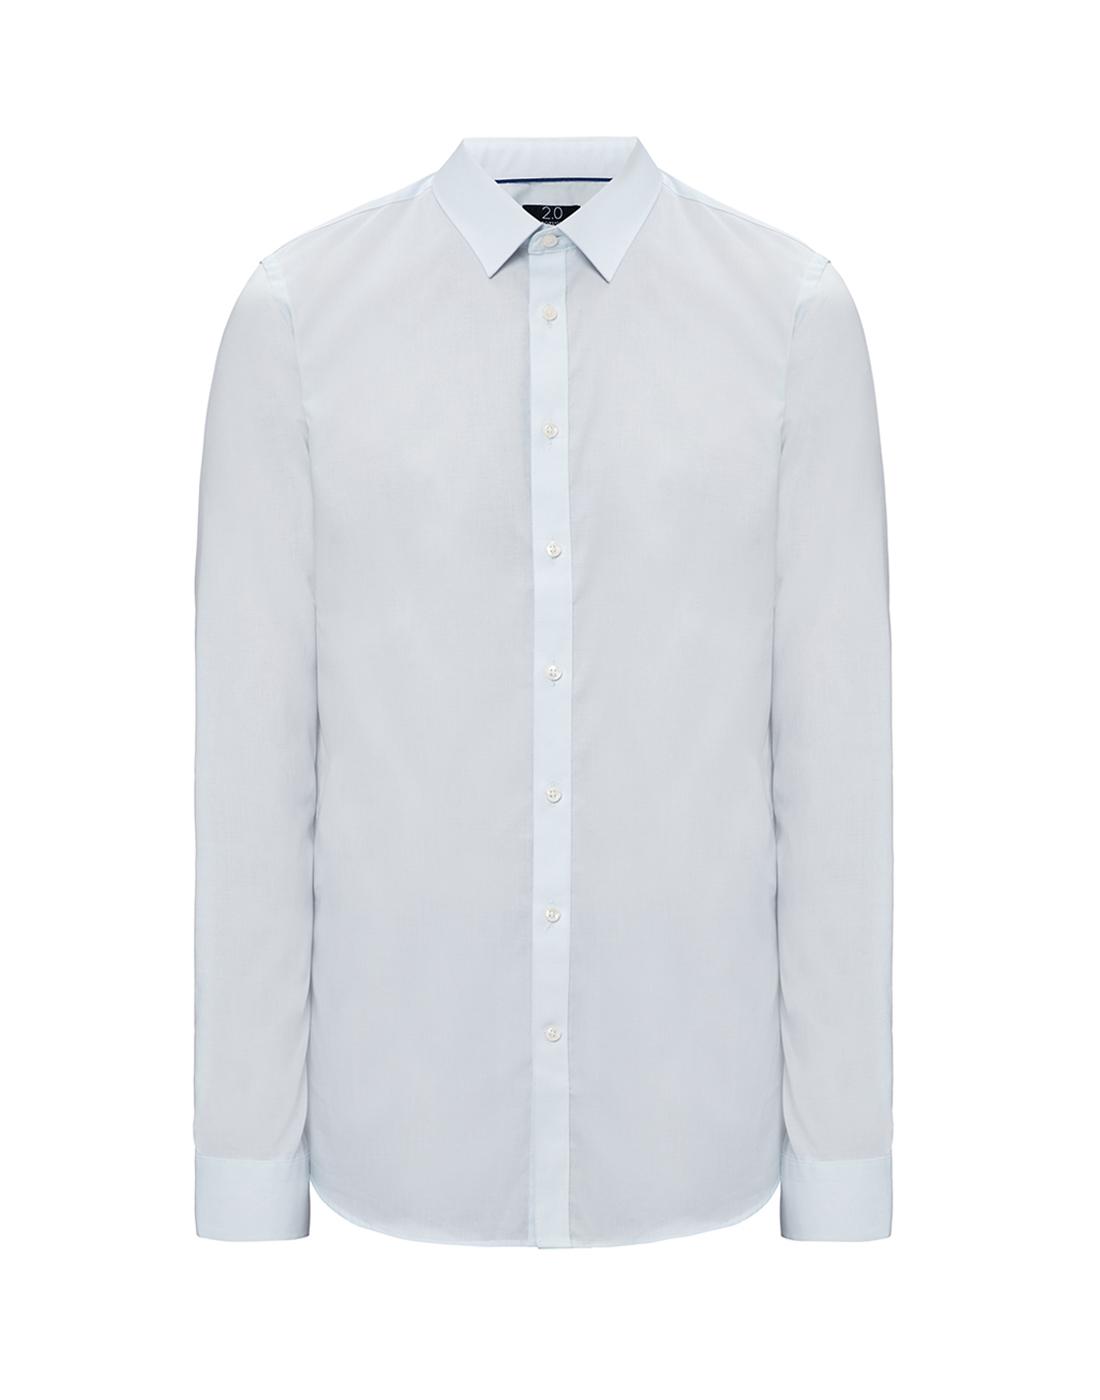 Мужская светло-голубая рубашка Profuomo SPP0H0D002-1